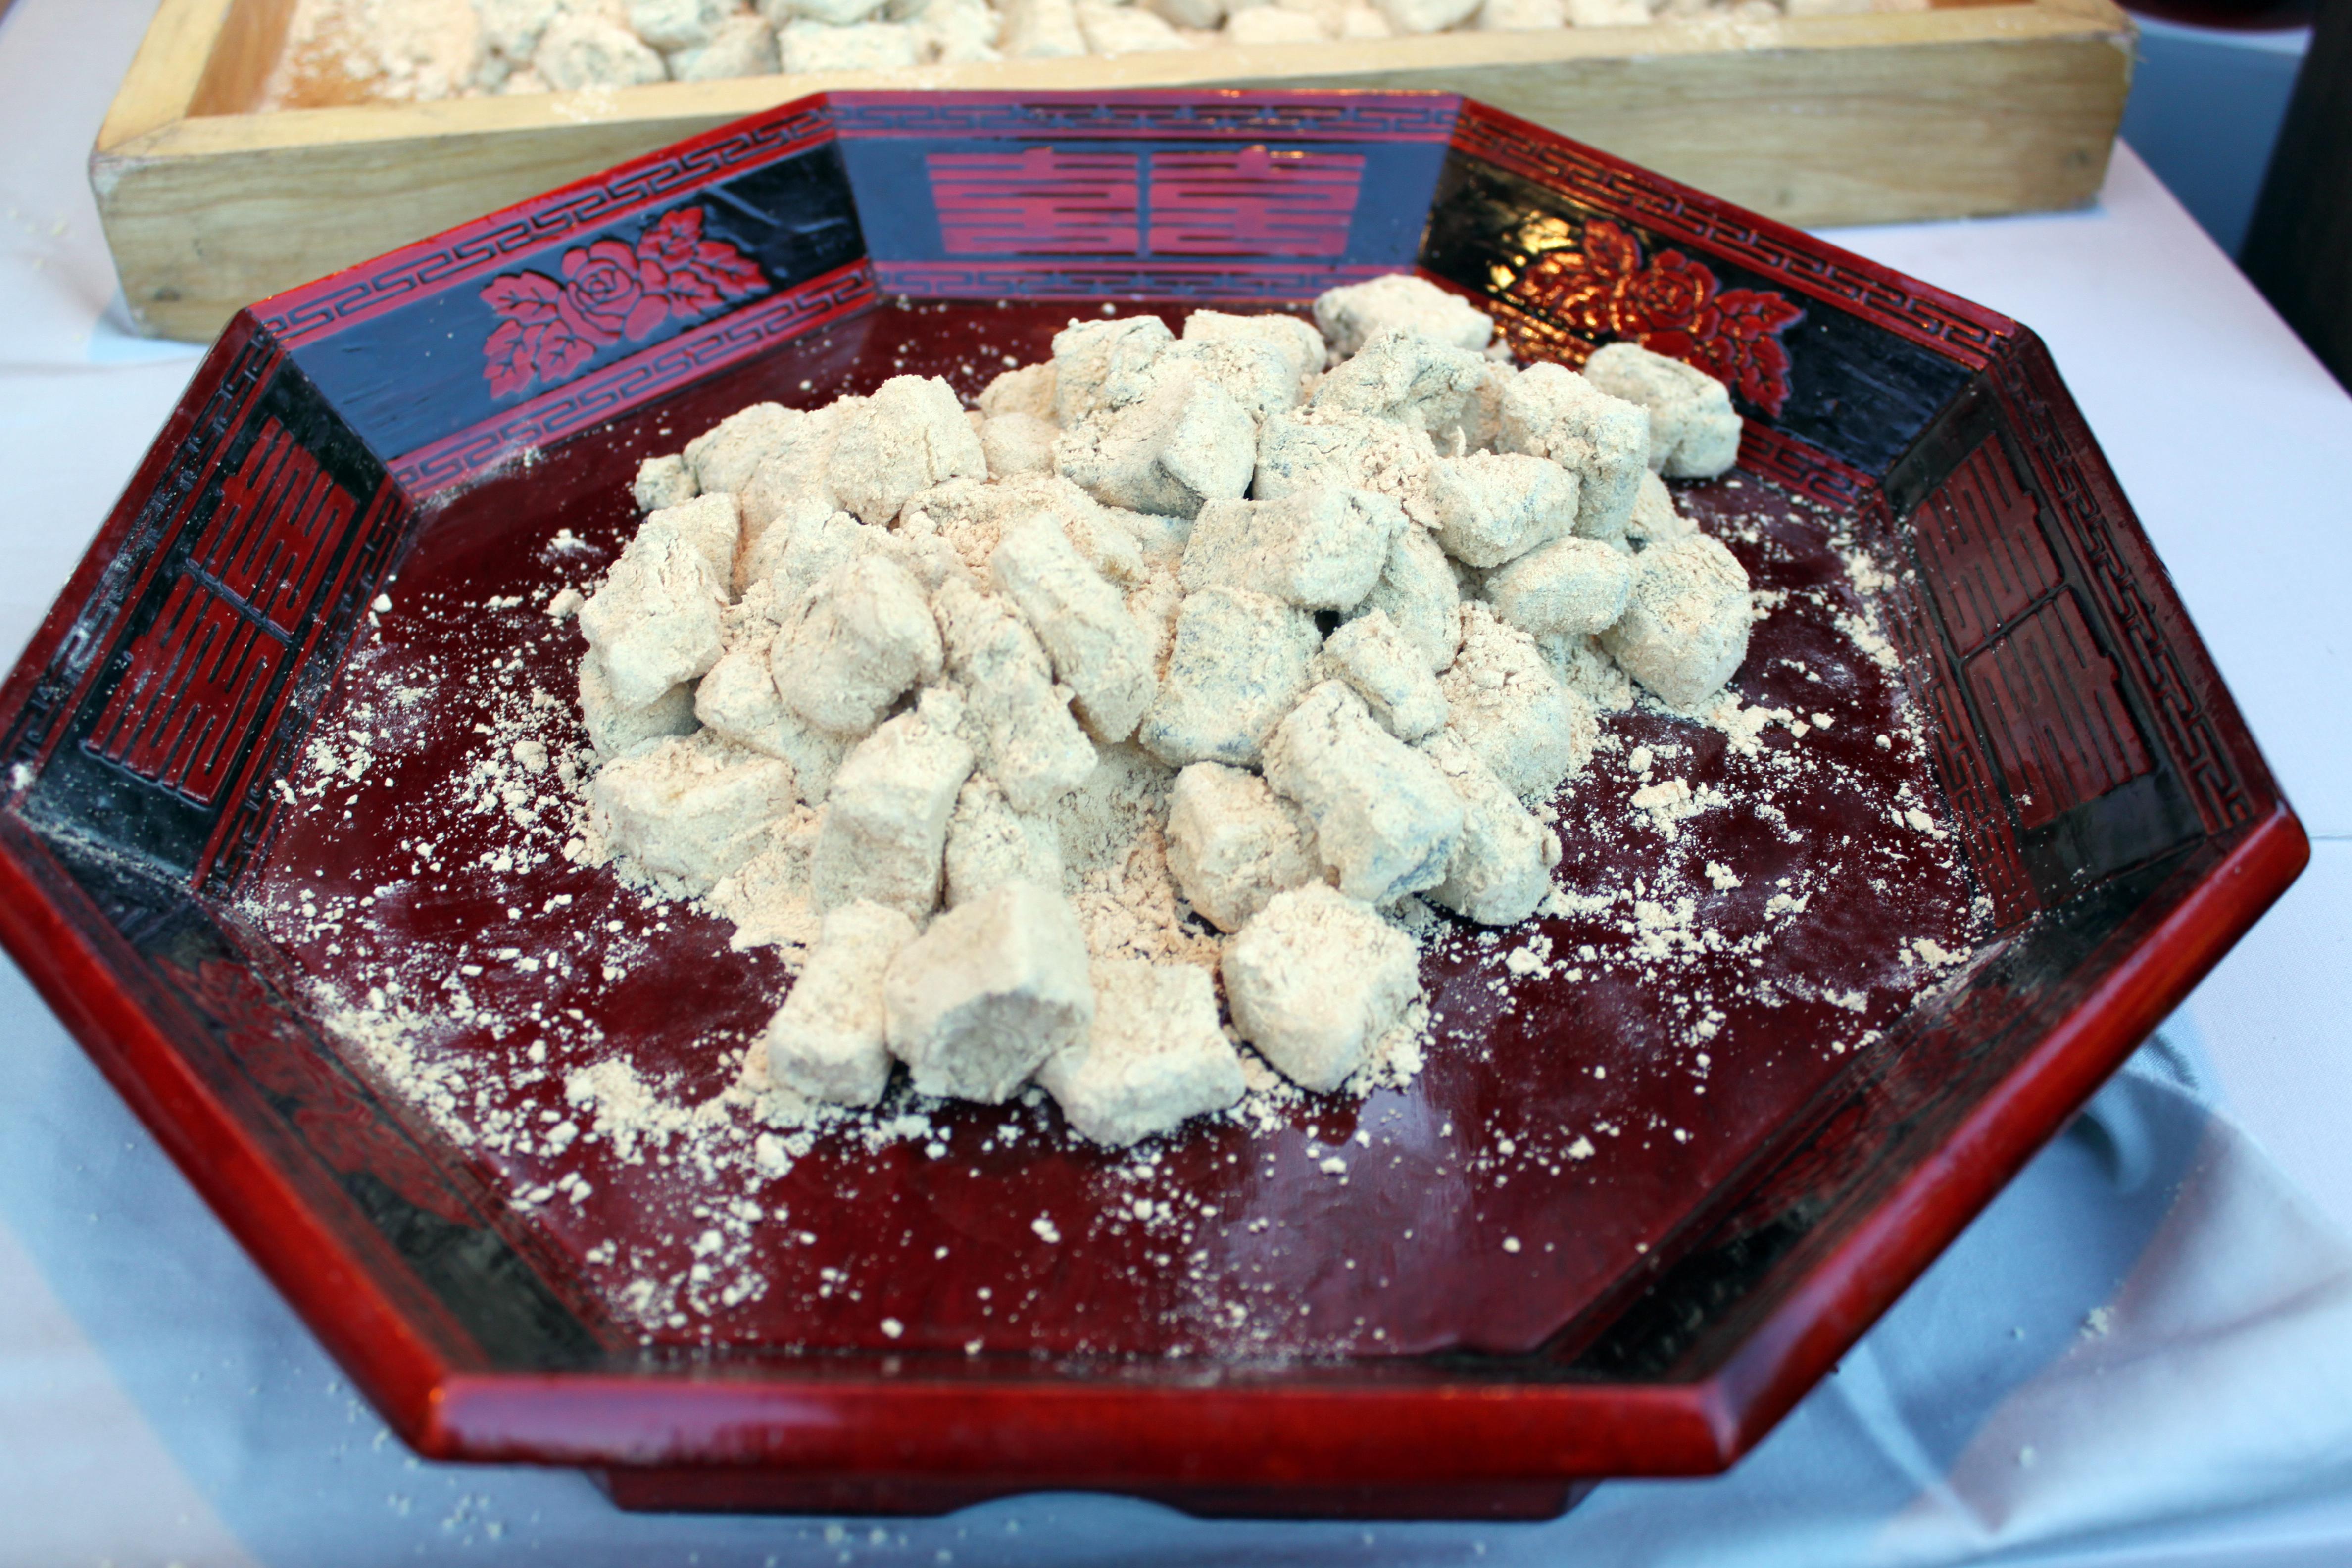 Korean rice cake with soybean powder-Injeolmi-01.jpg